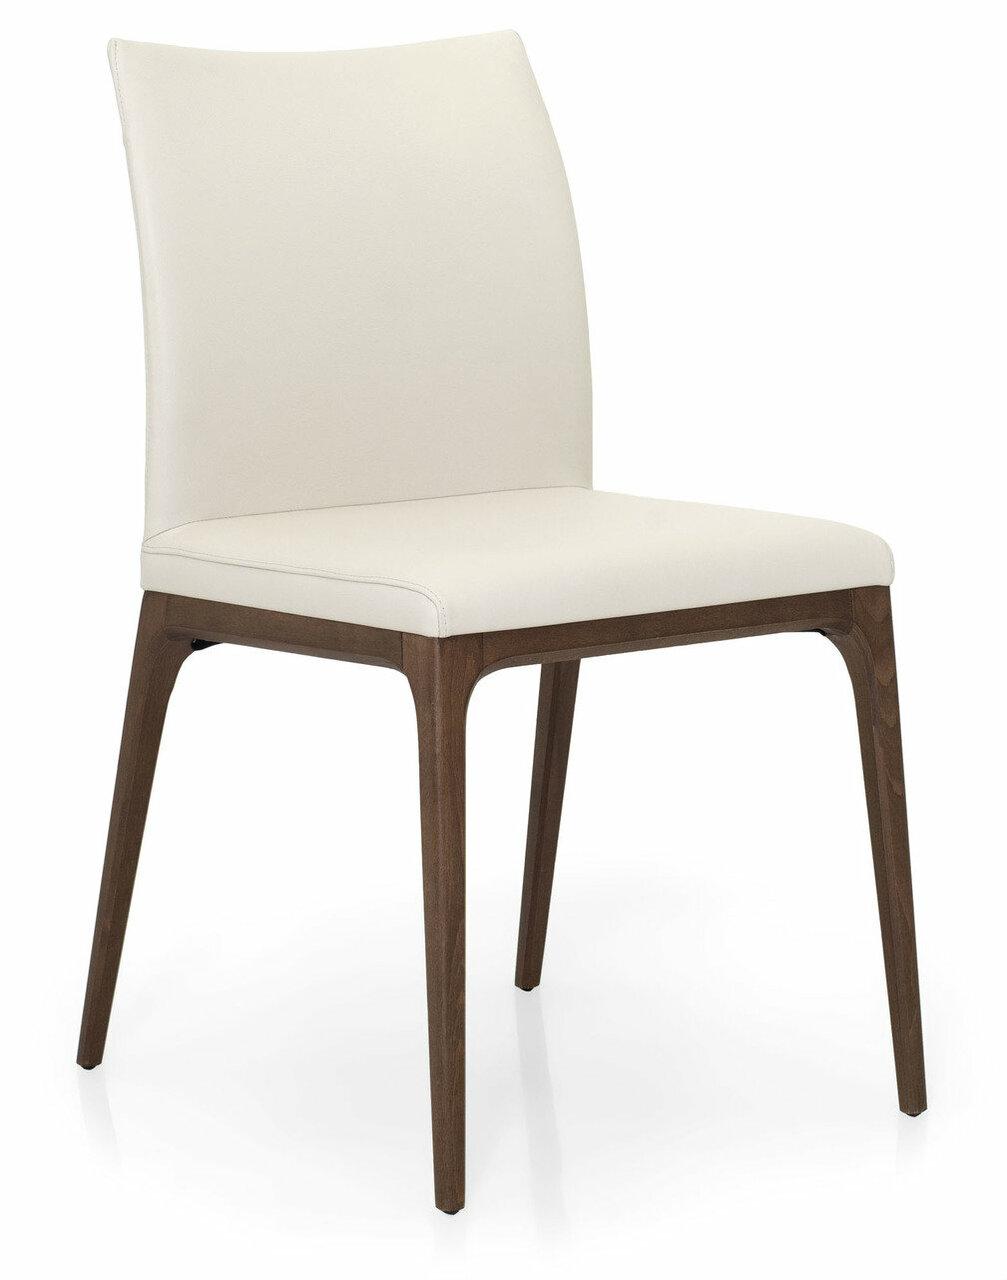 Arcadia Dining Chair Cantoni Cantoni